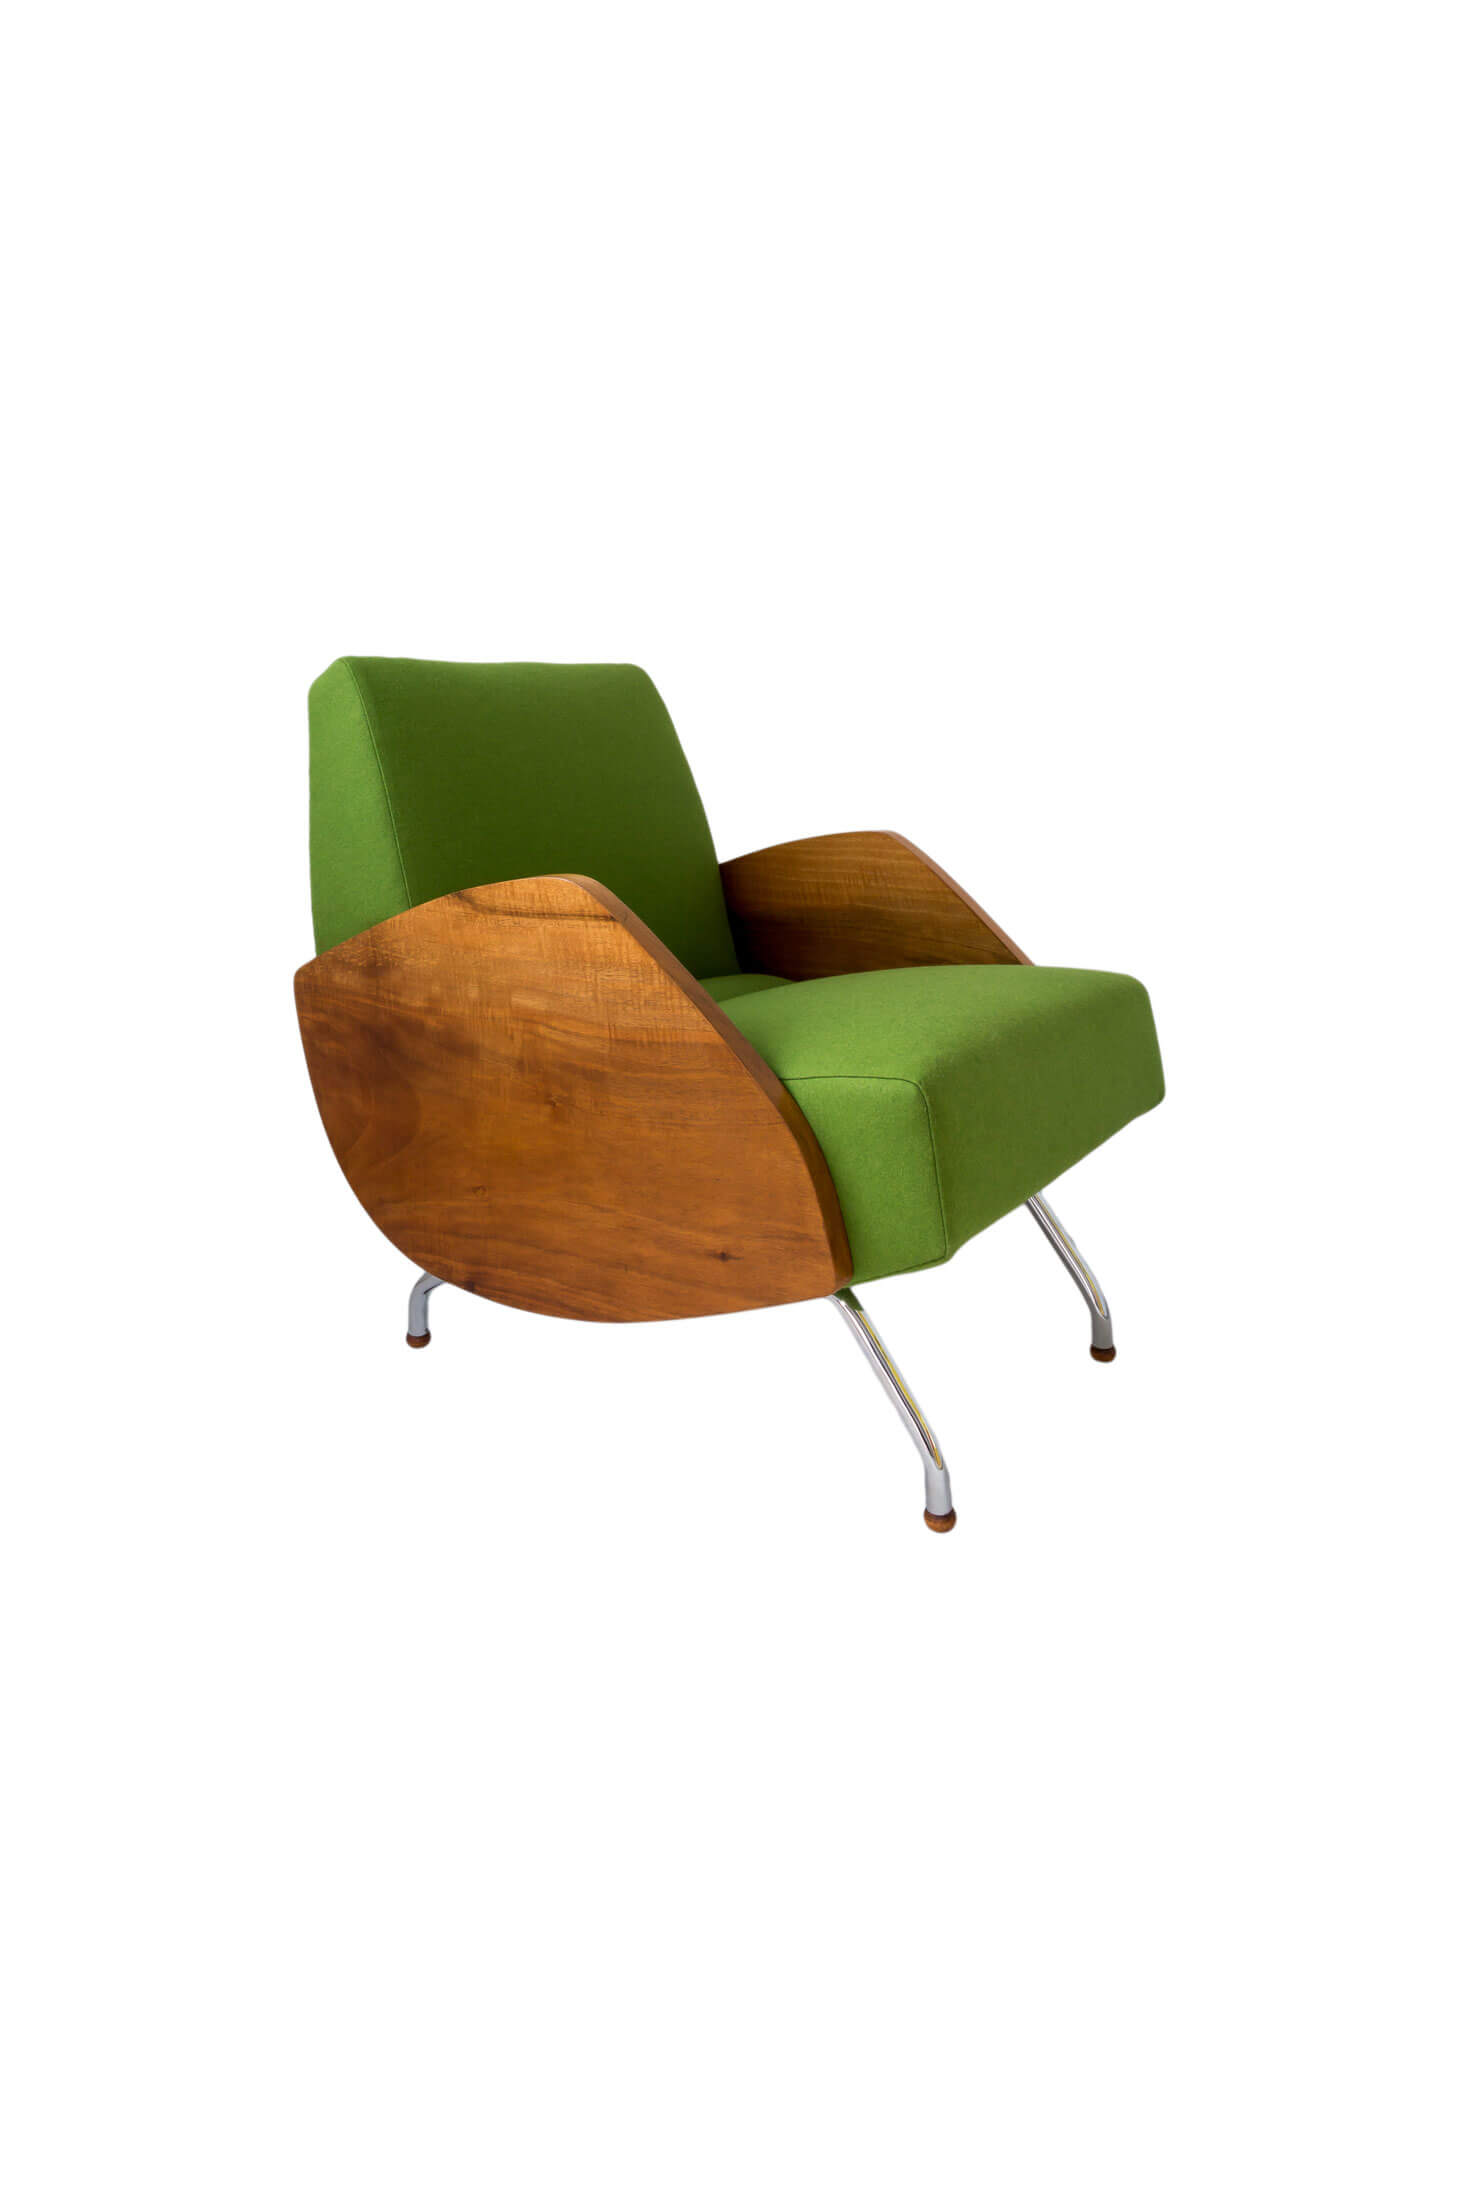 Fotel 360 Proj J Różański